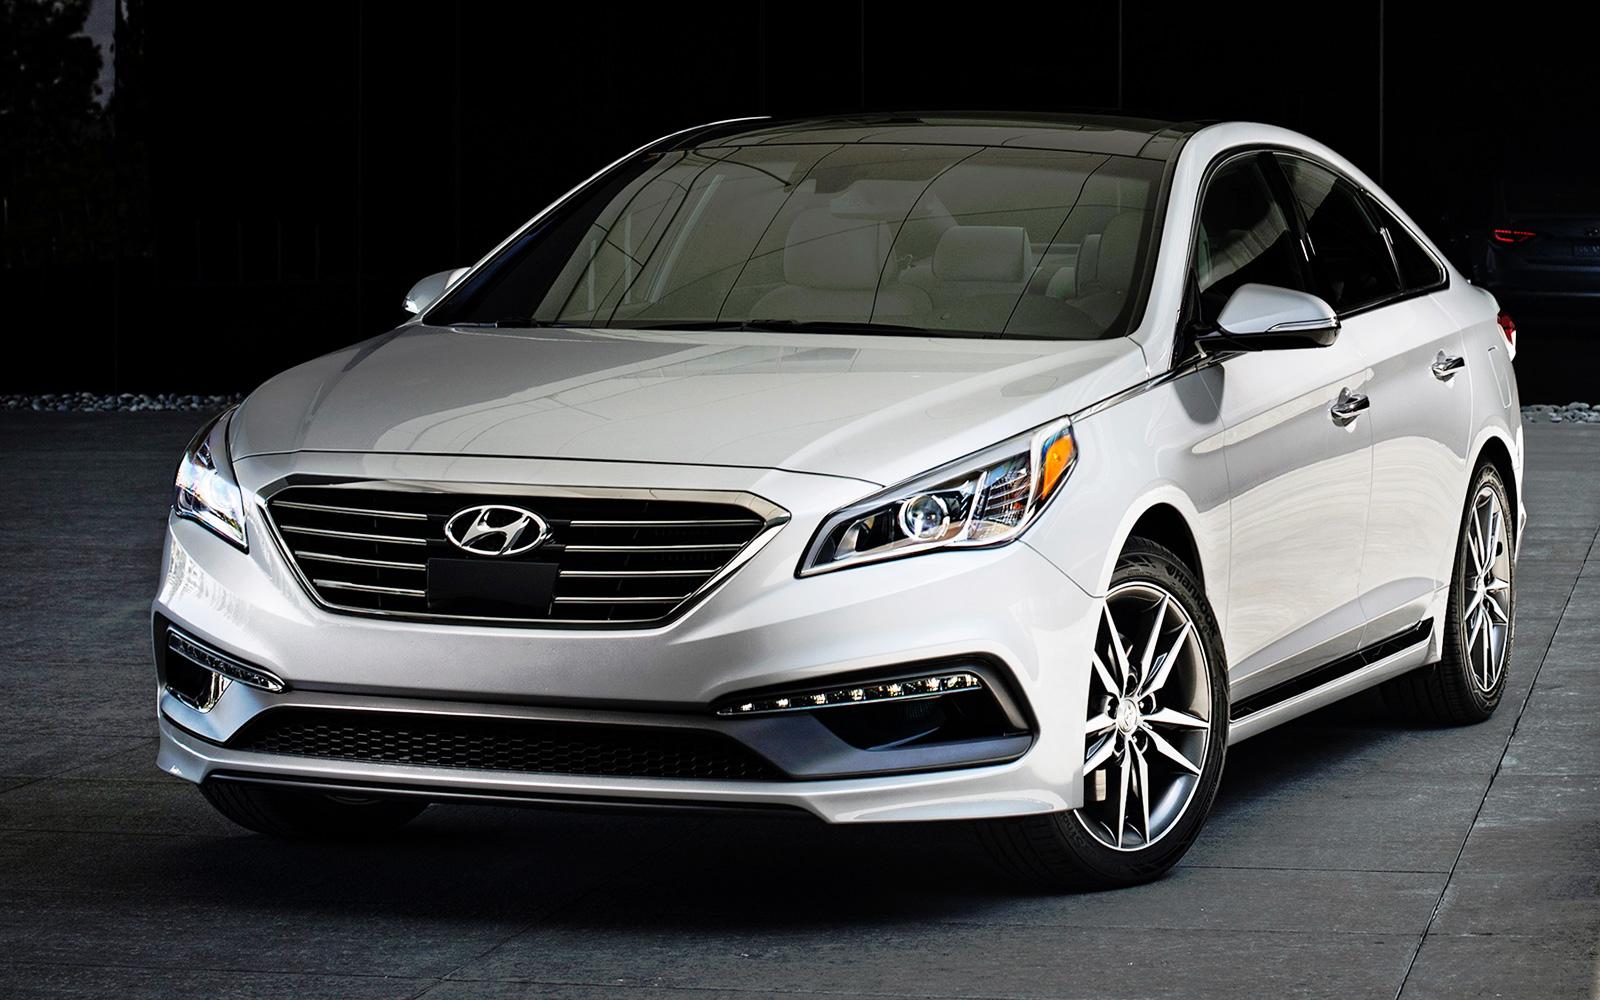 Хендай Соната 2018 (Hyundai Sonata): обзор, характеристики, цены, фото